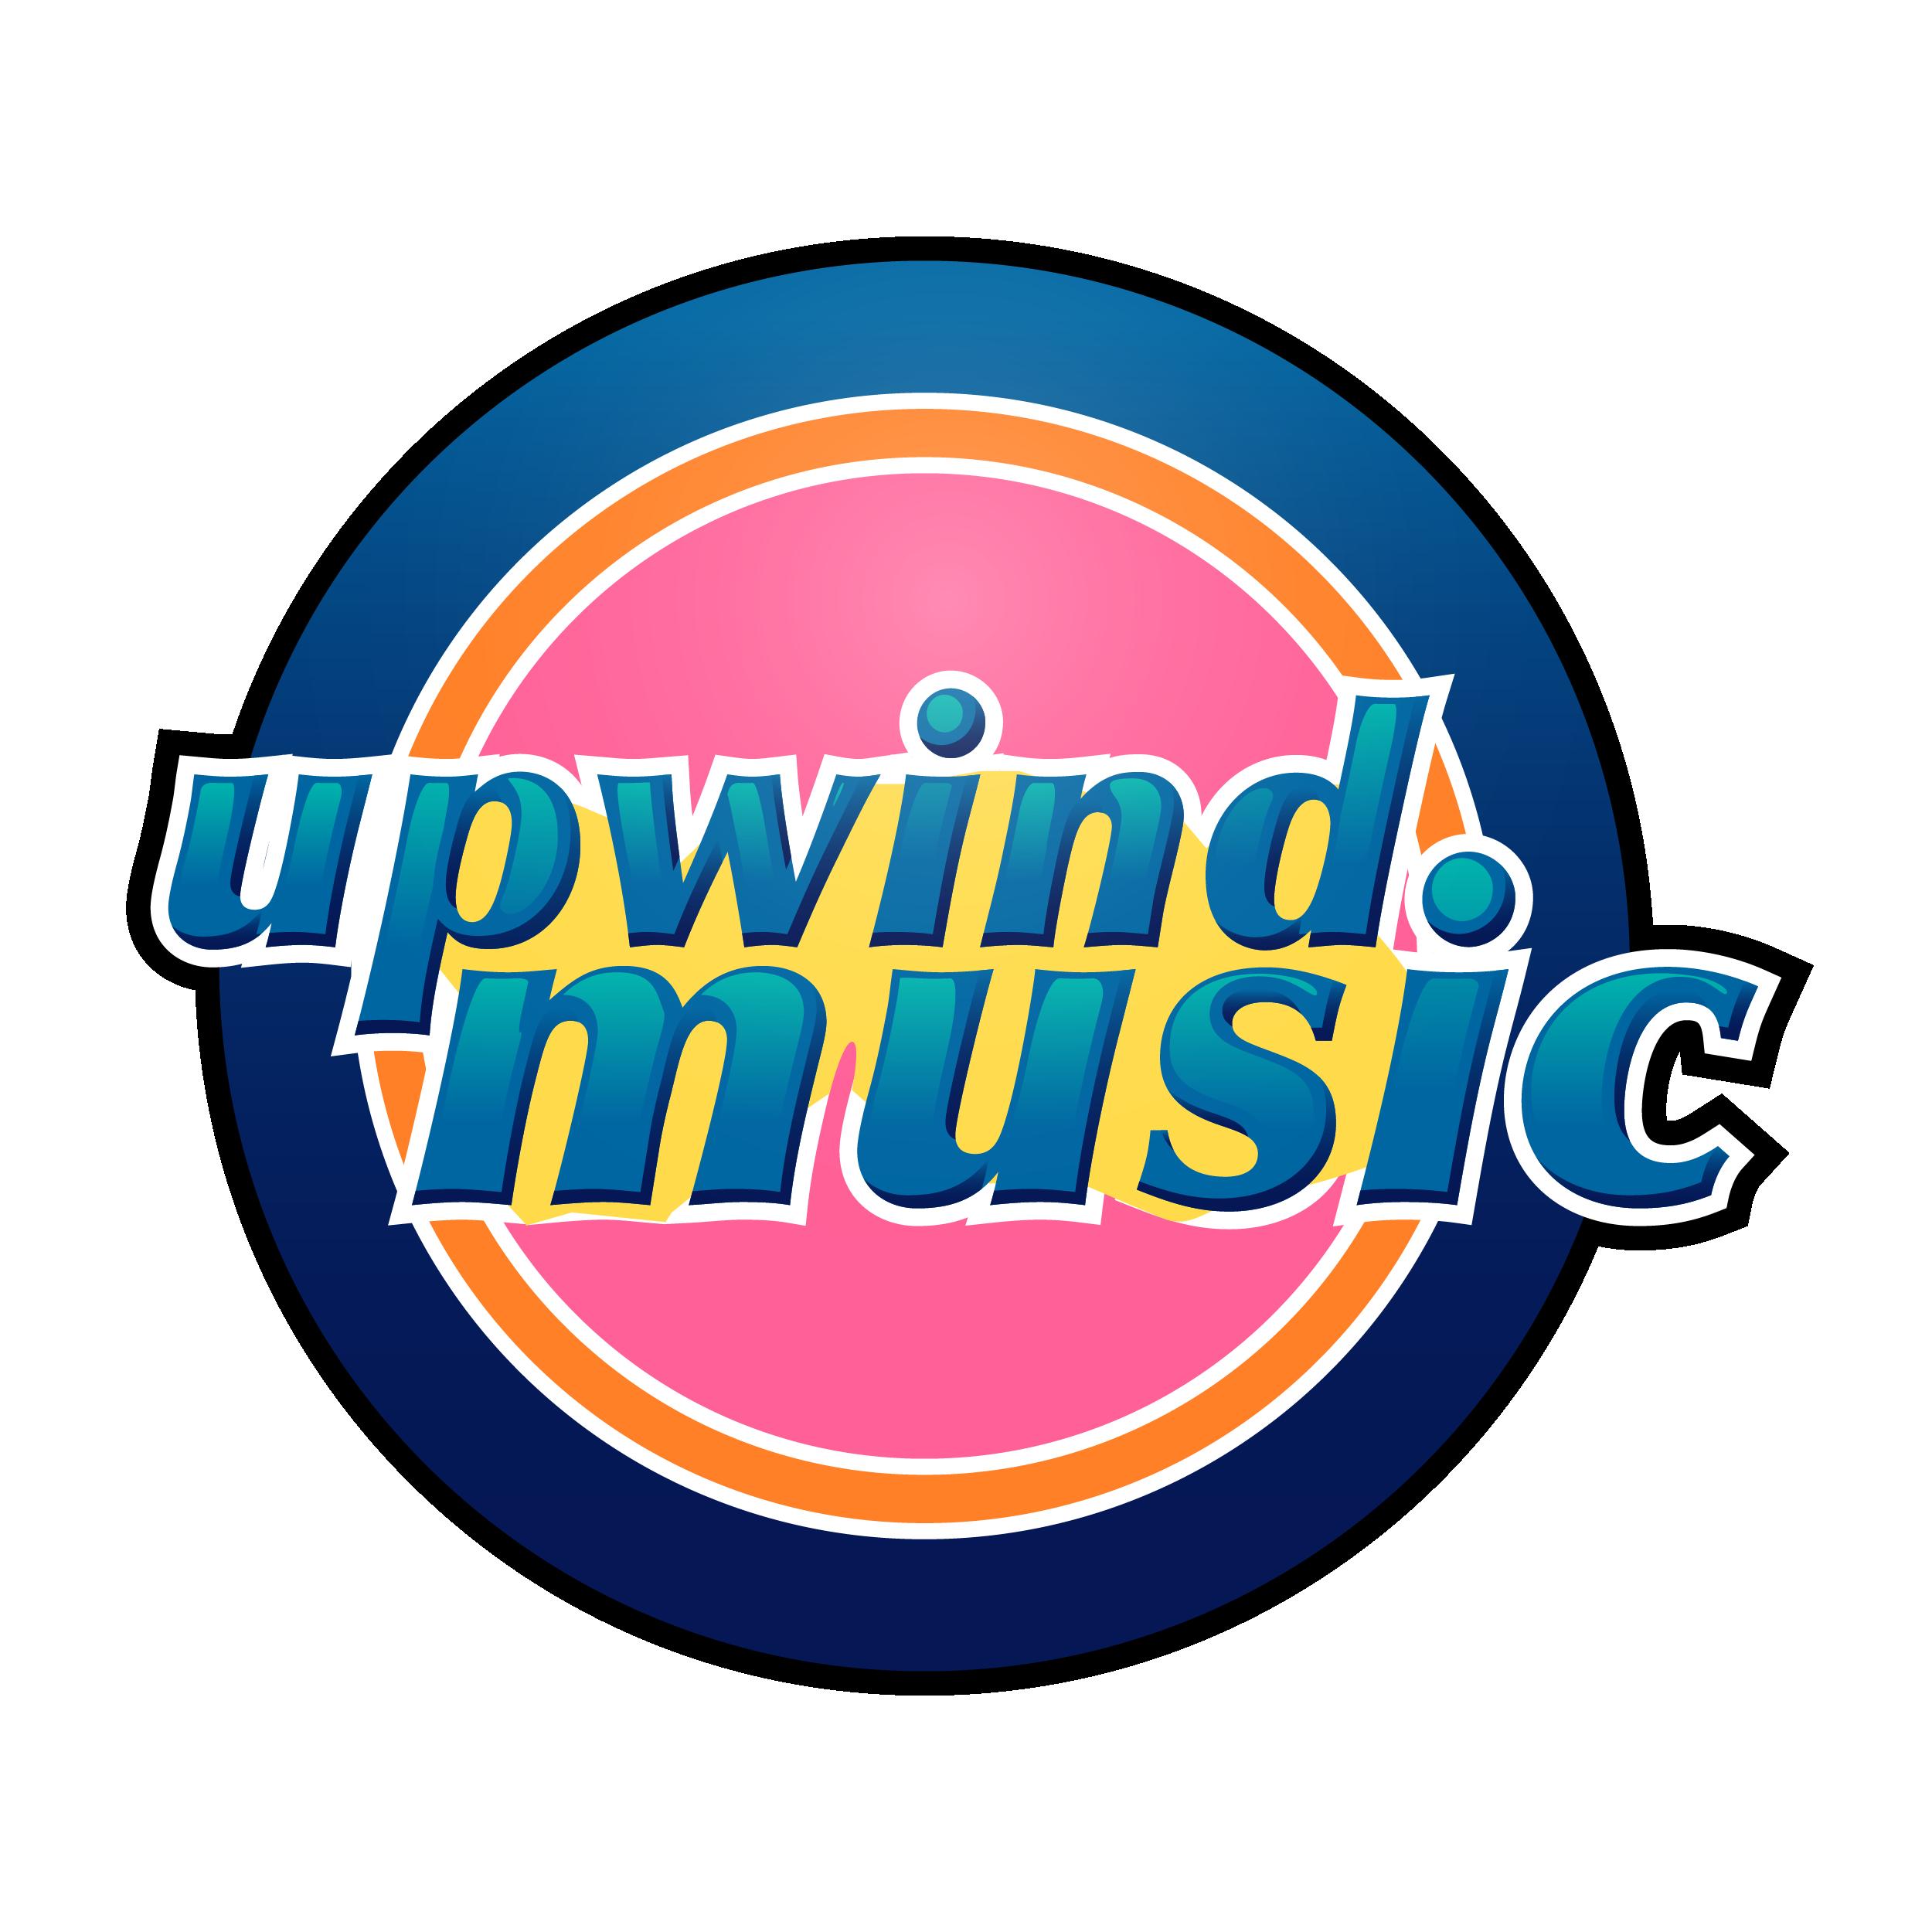 upwind music